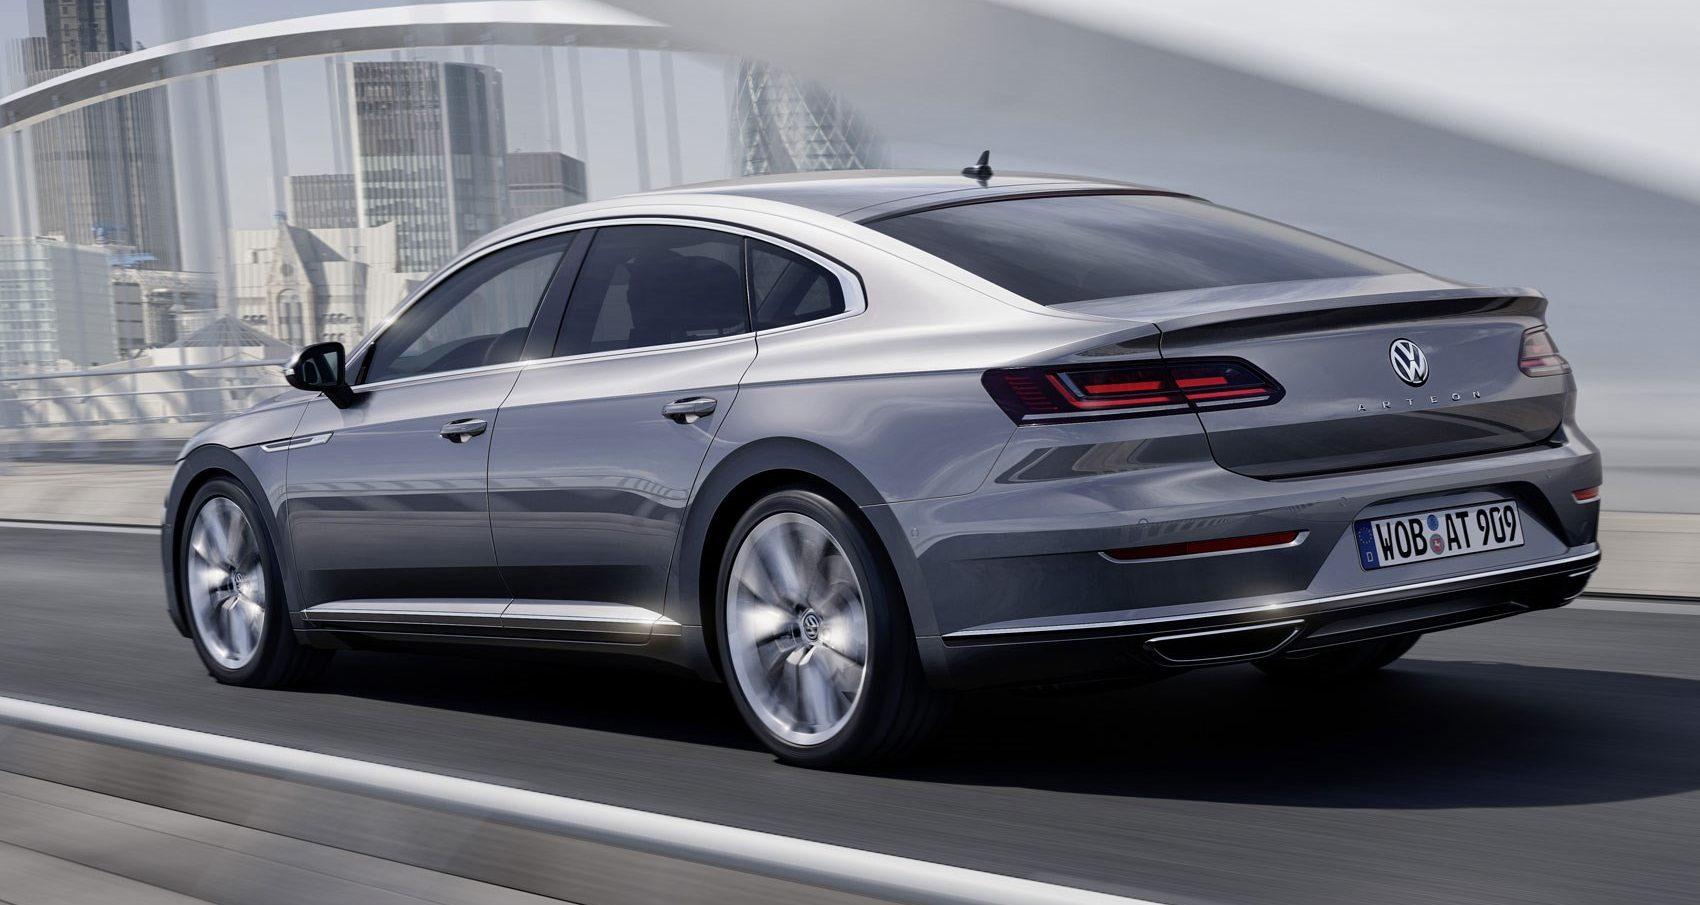 VW Arteon Usa >> Look A Like Vw Arteon And Carsalesbase Com